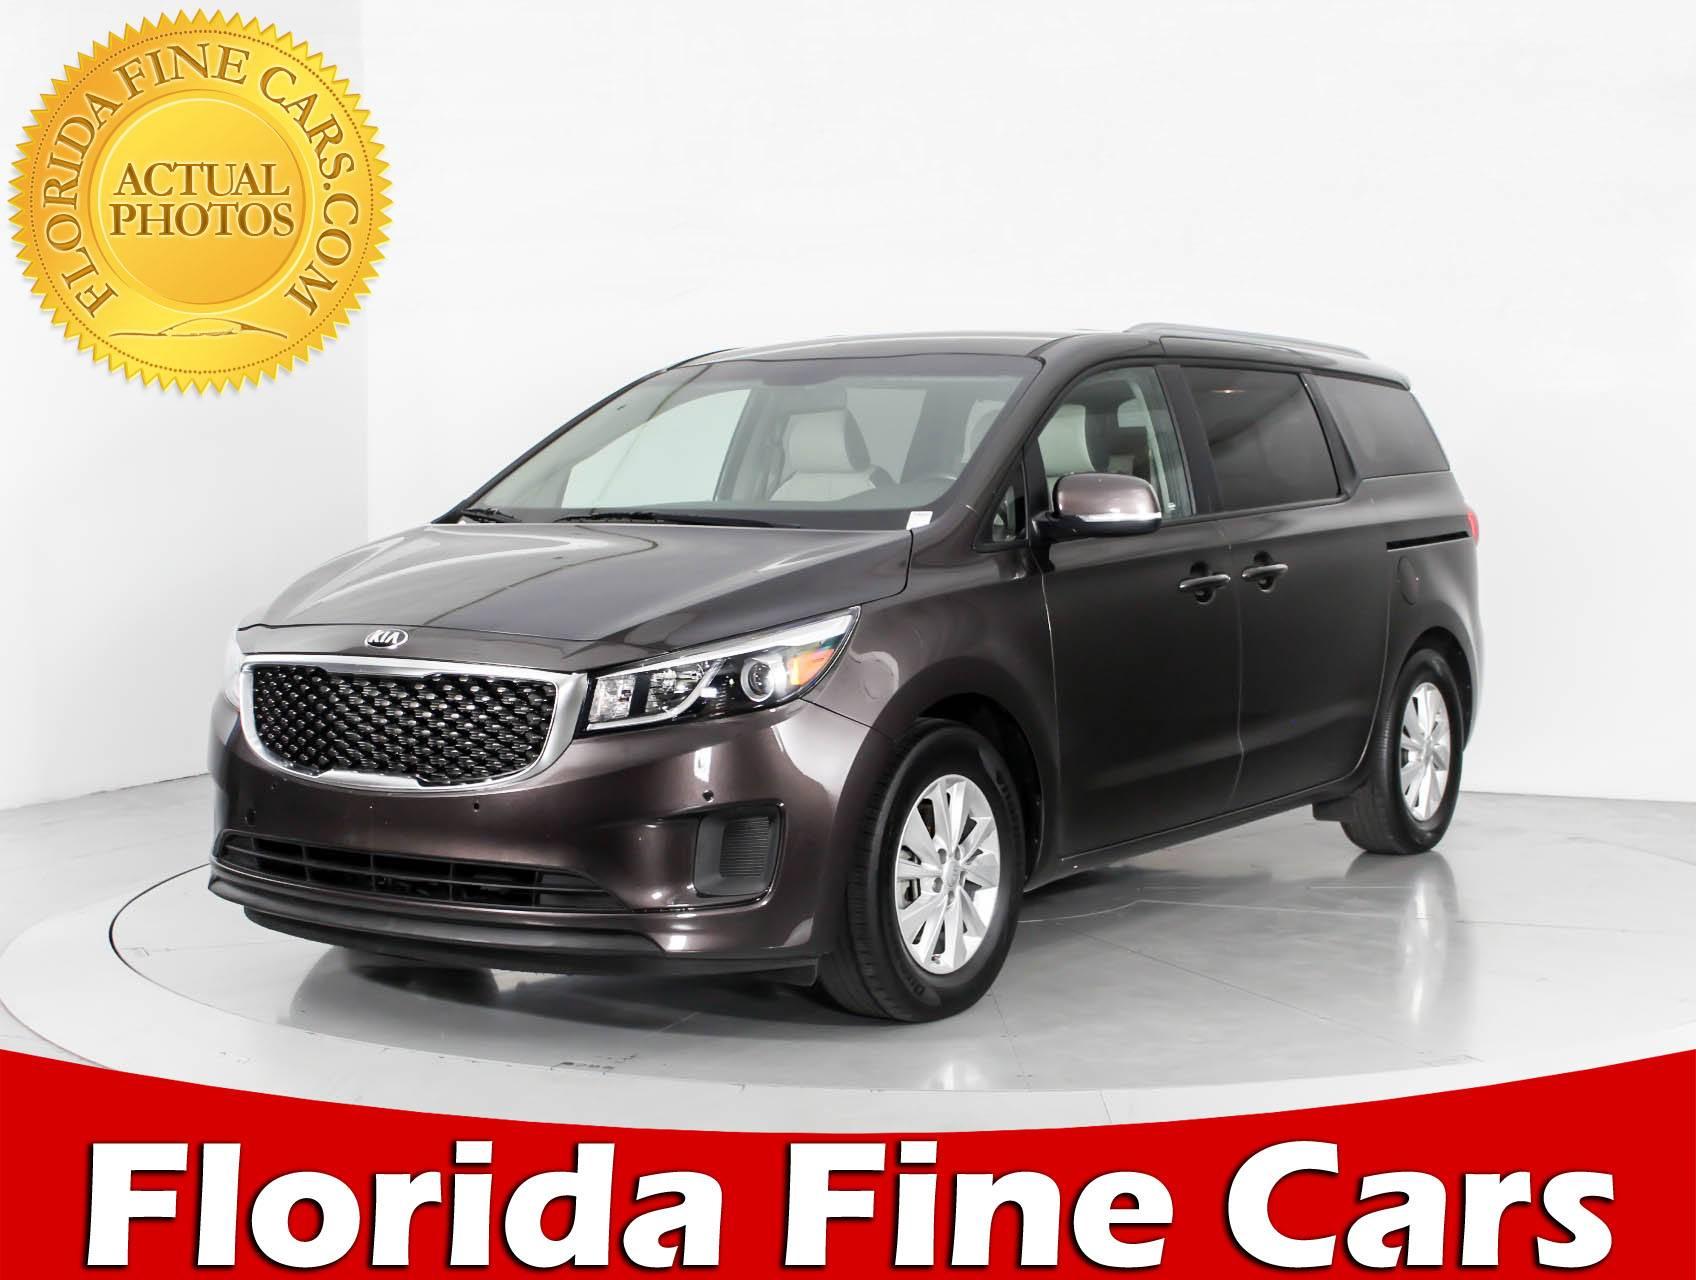 Used 2017 KIA SEDONA Lx Minivan for sale in WEST PALM FL